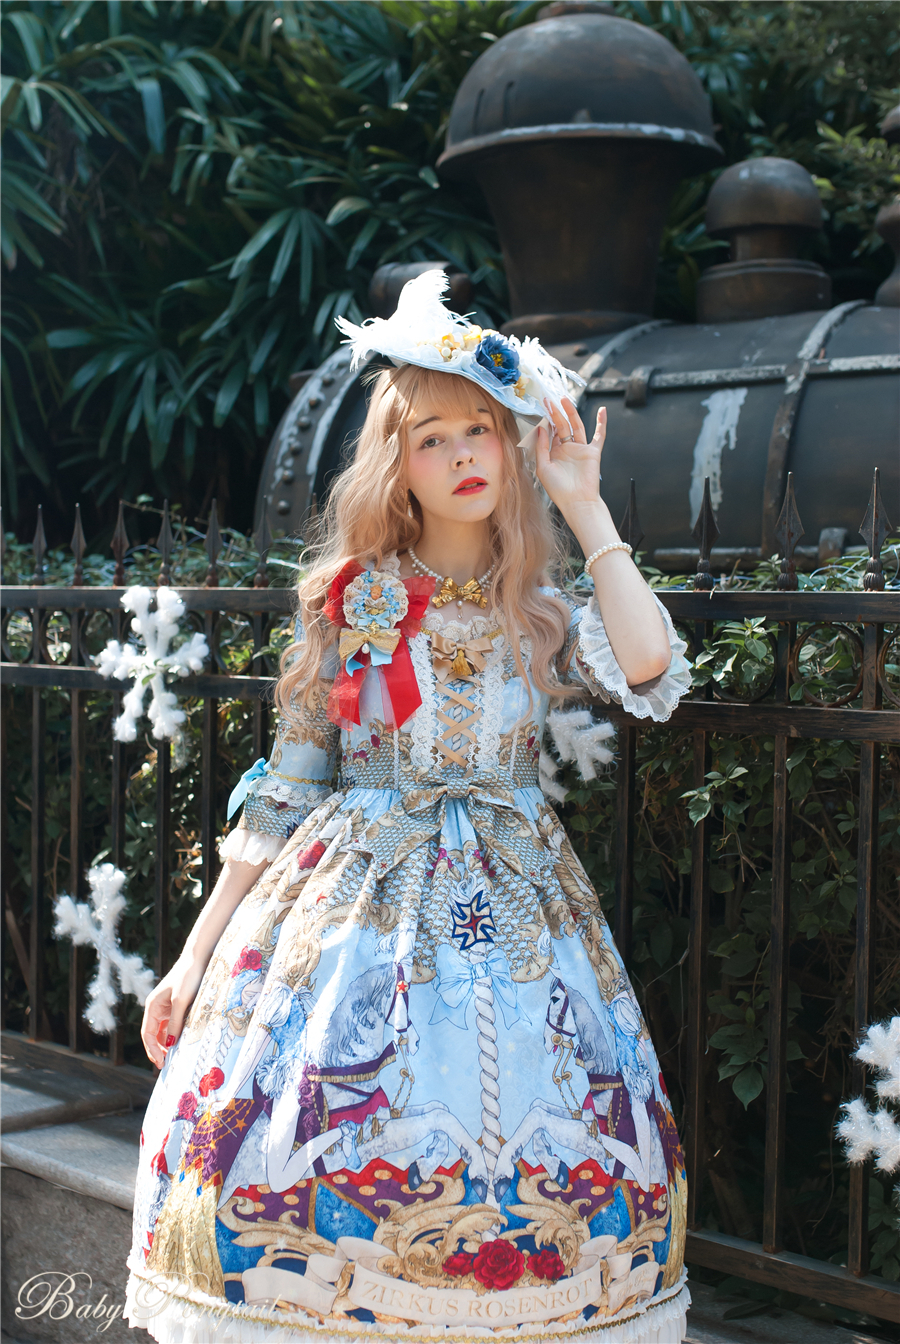 Baby Ponytail_Circus Princess_Sax OP_Claudia_10.jpg